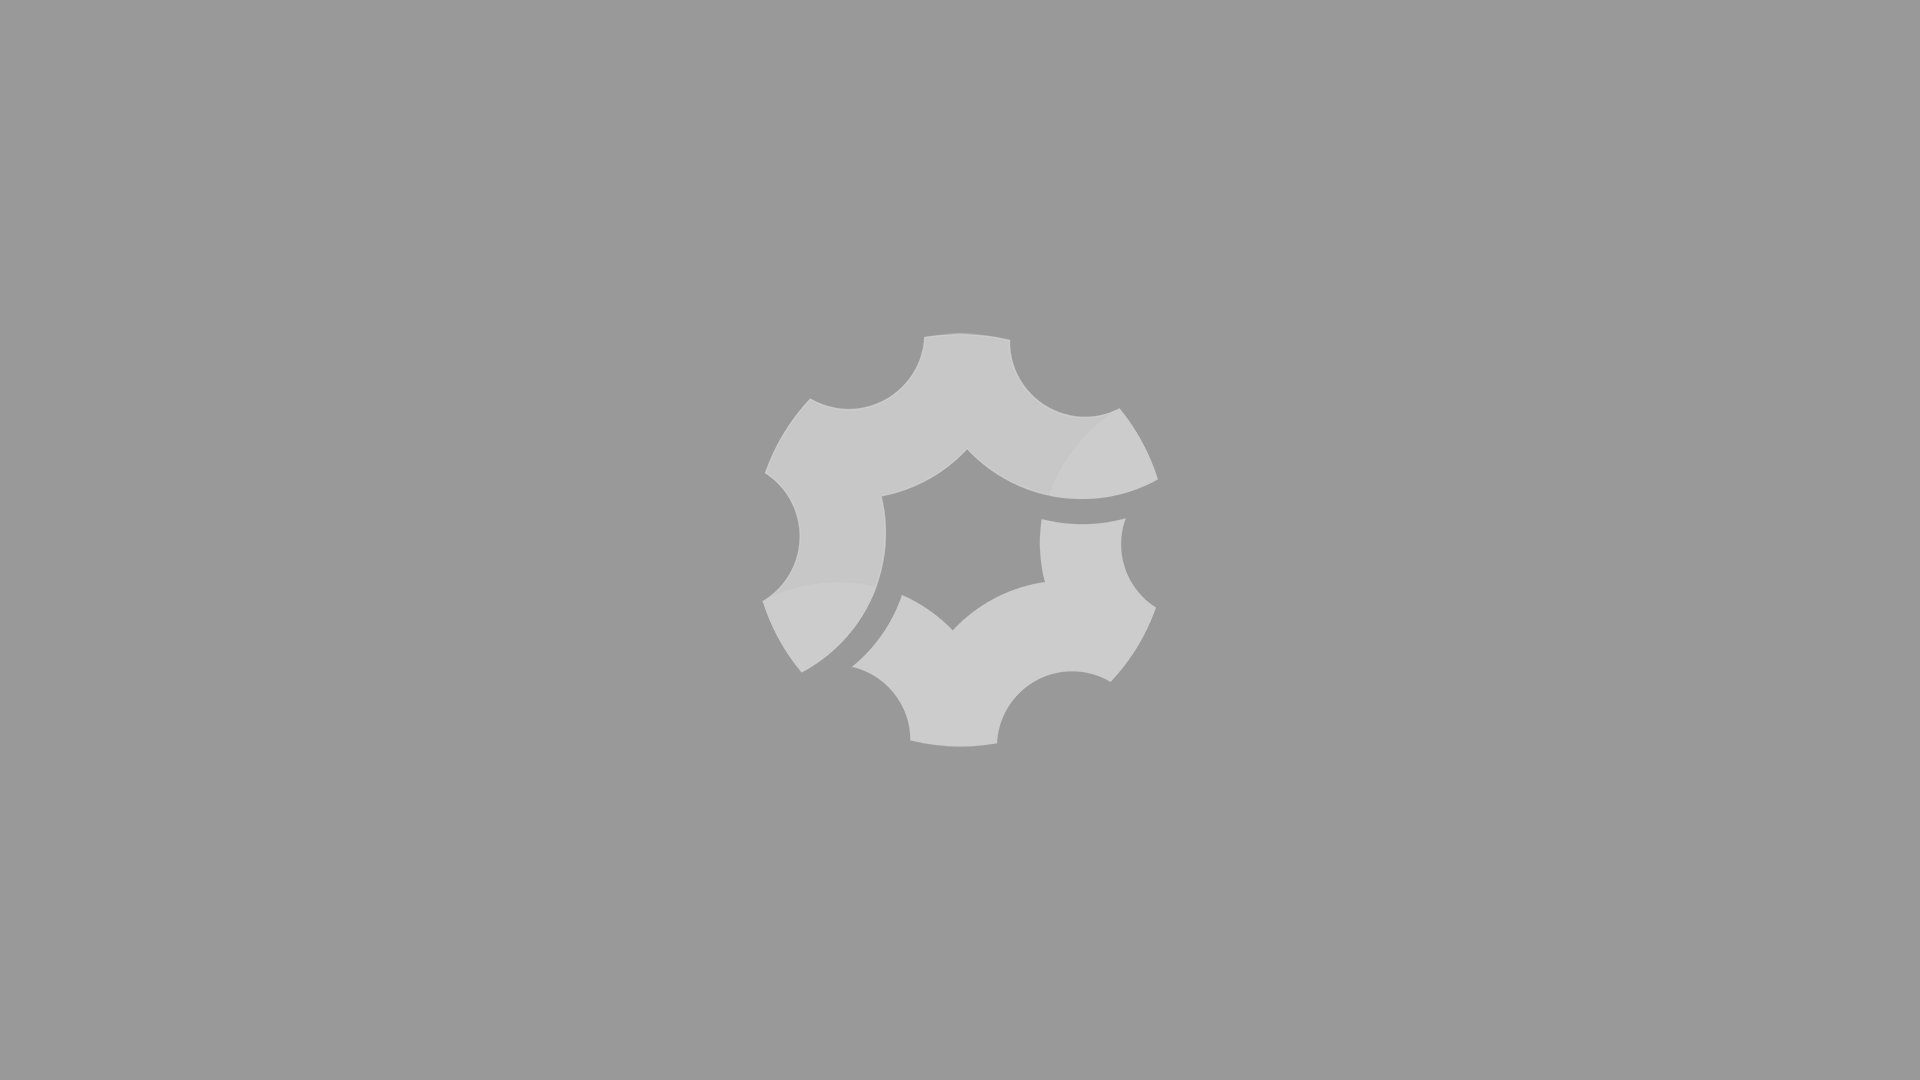 historical_norman_names_mod_logo.png